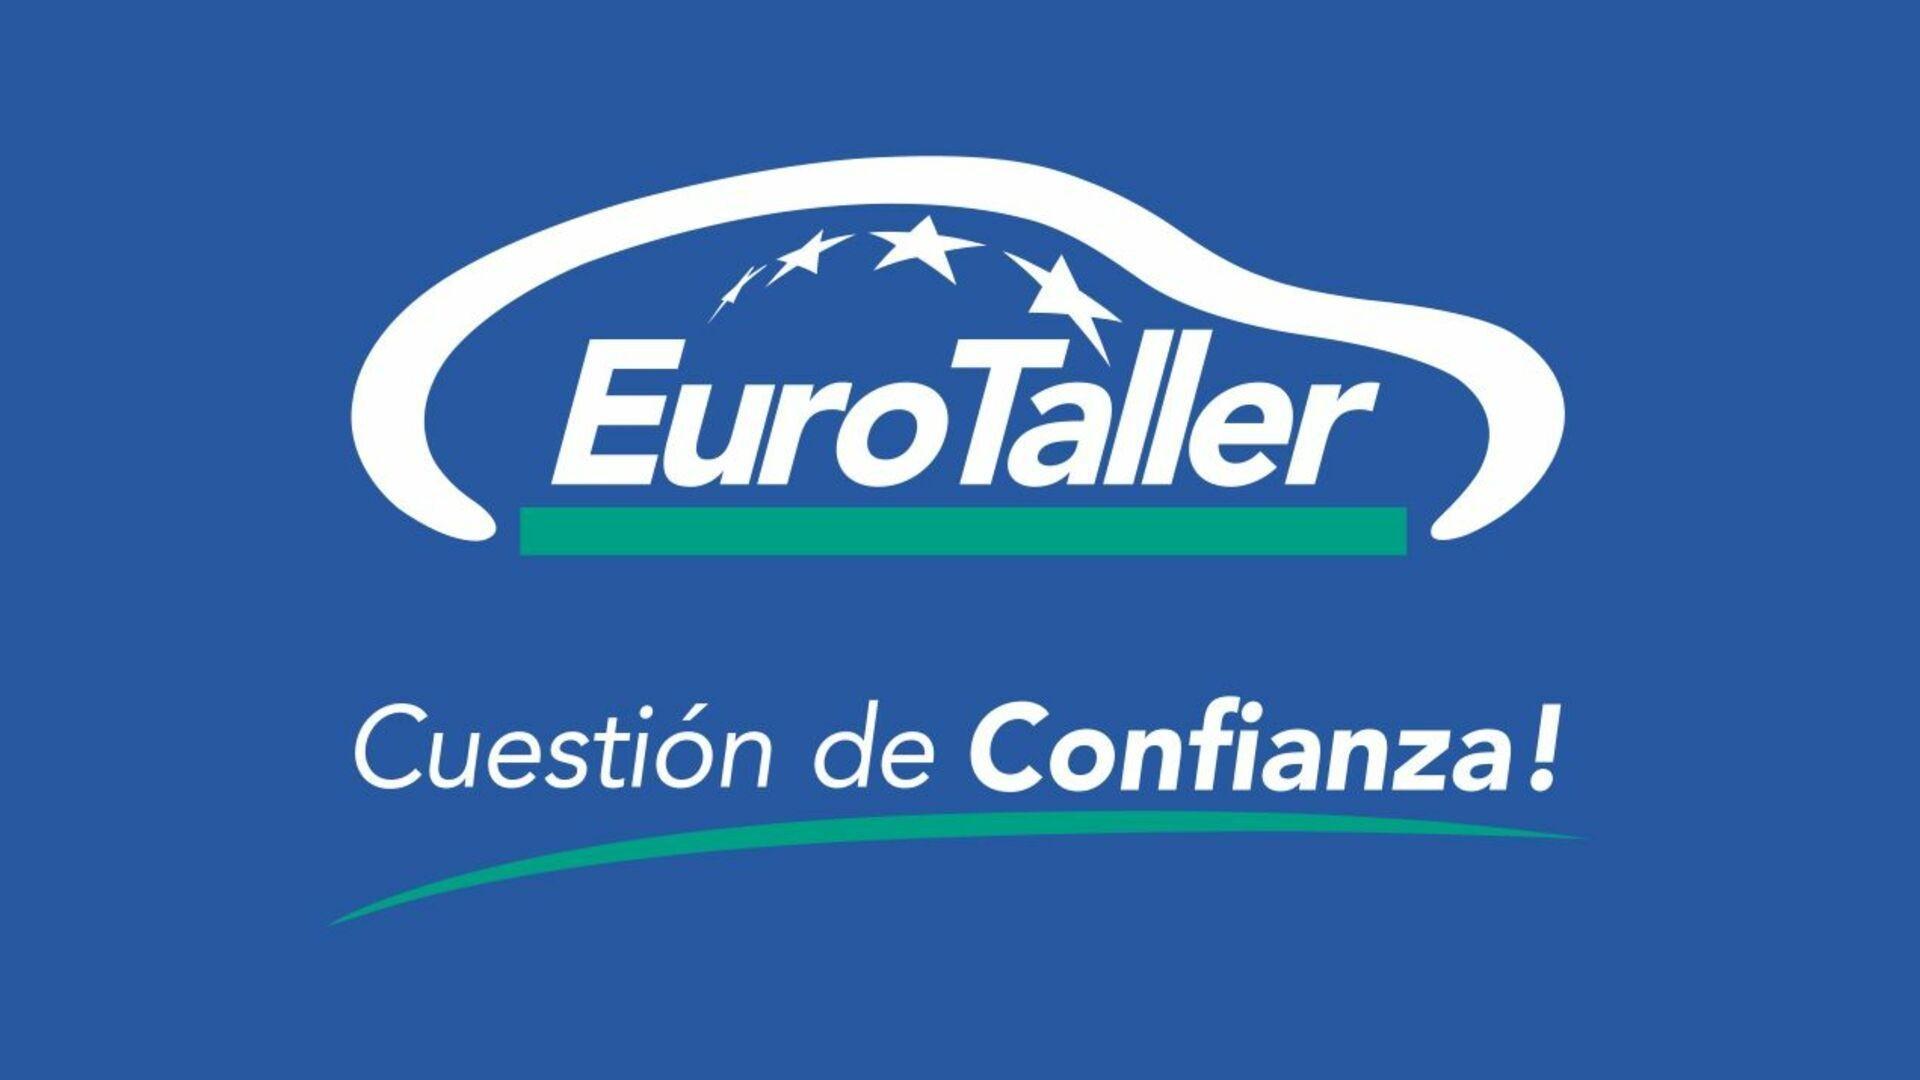 resource5b14f1da6e467_jobacarcom_eurotaller-jobacar-tu-taller-multimarca-en-tarragona